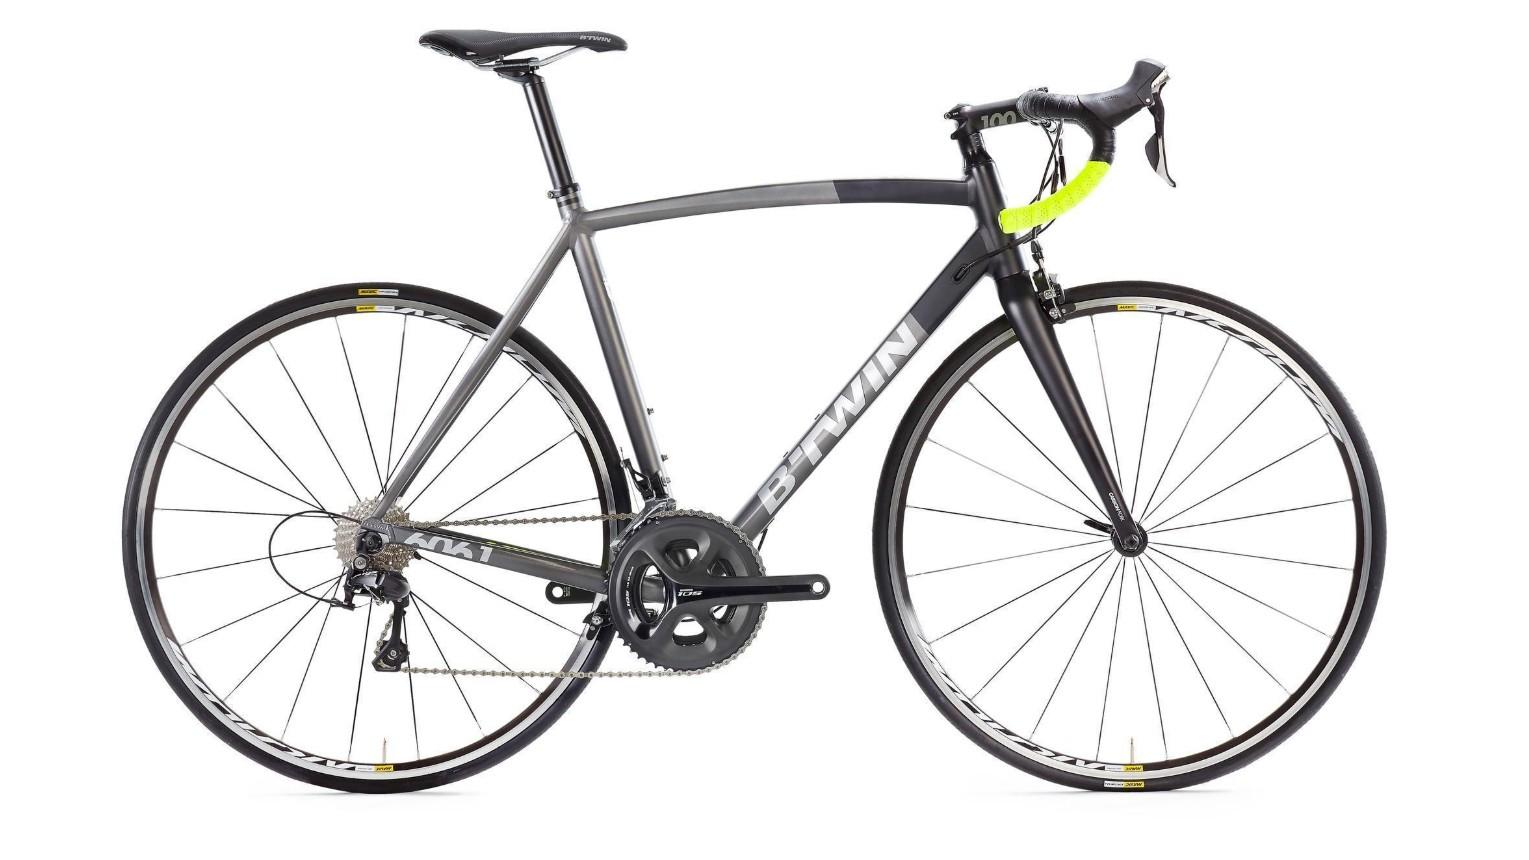 B'Twin's alloy bikes offer huge value for money